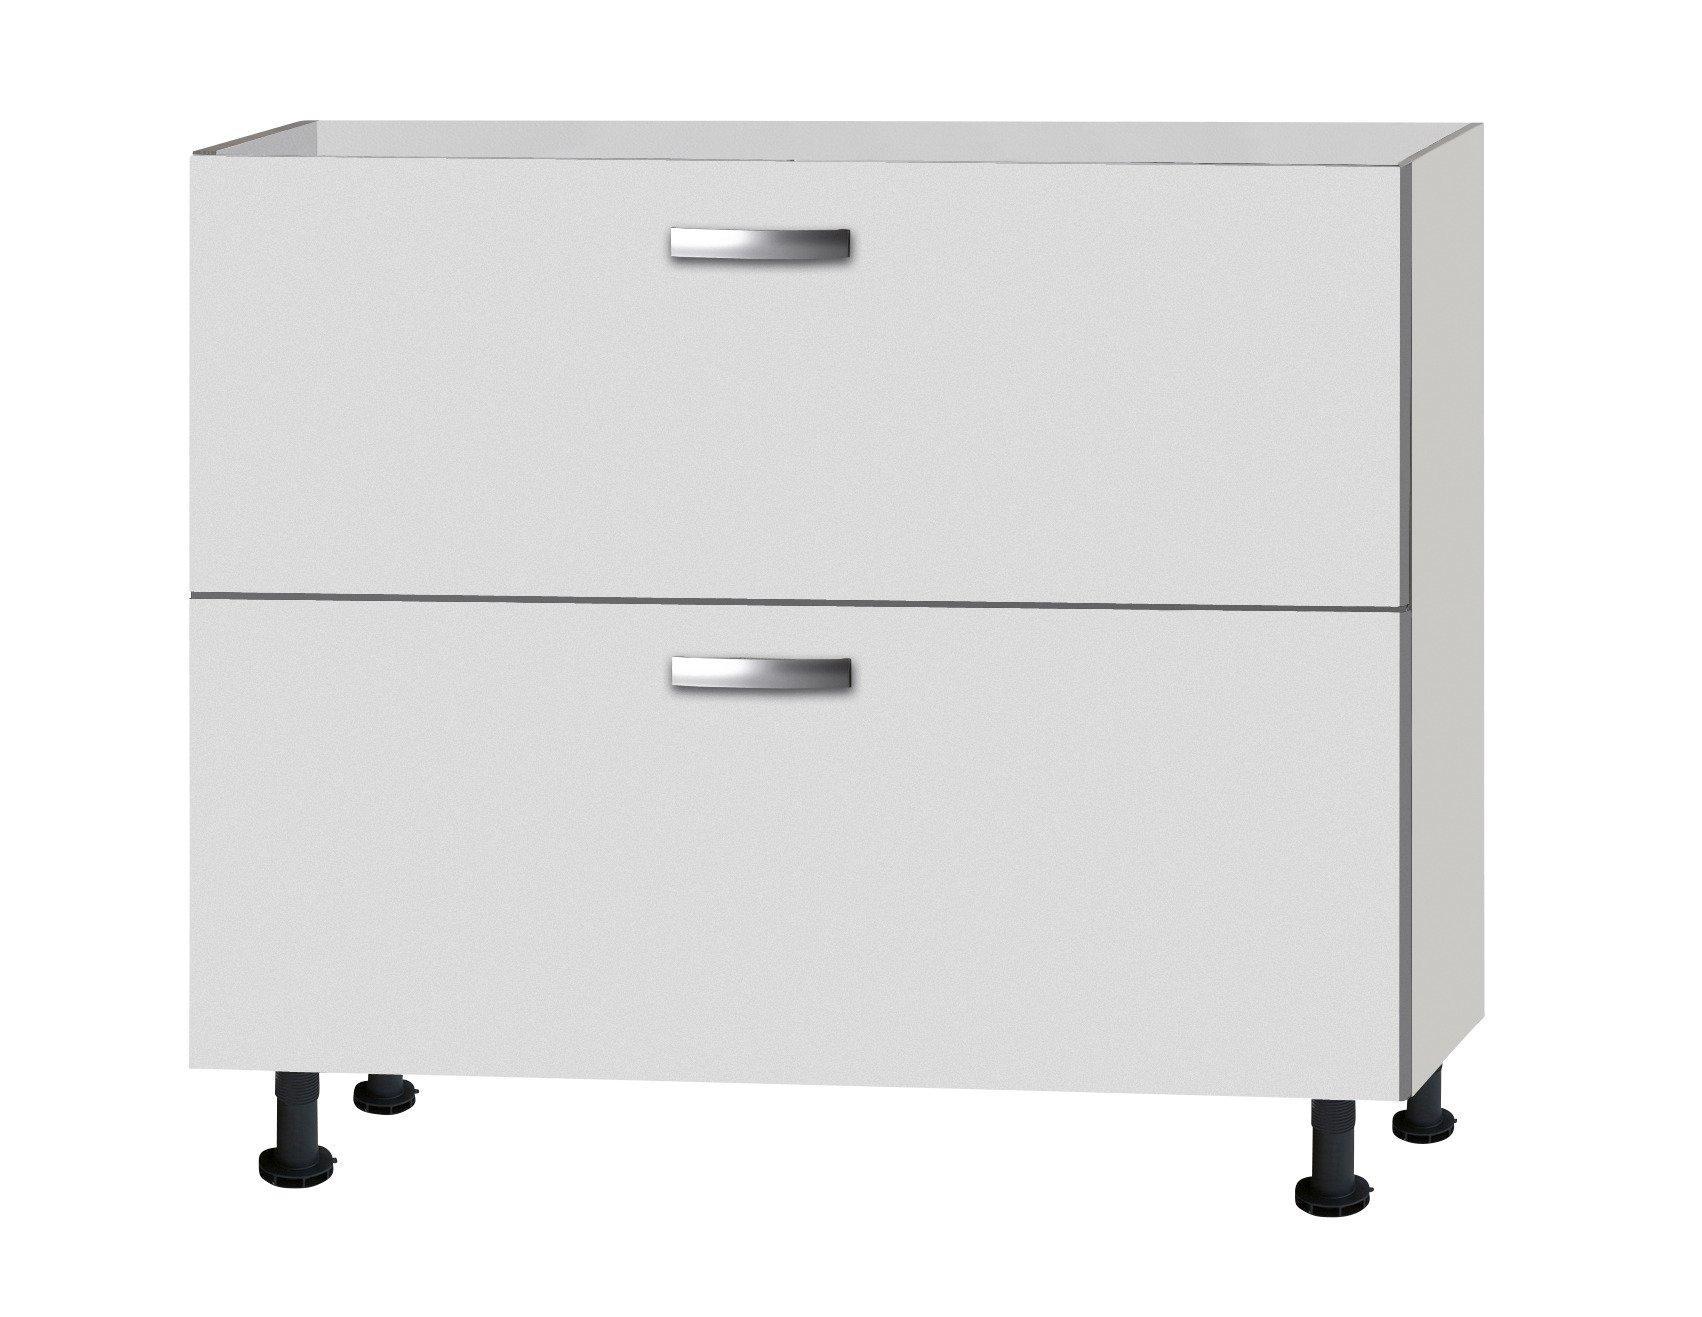 Full Size of Küchenunterschrank Optifit Kchenunterschrank Ole Wohnzimmer Küchenunterschrank